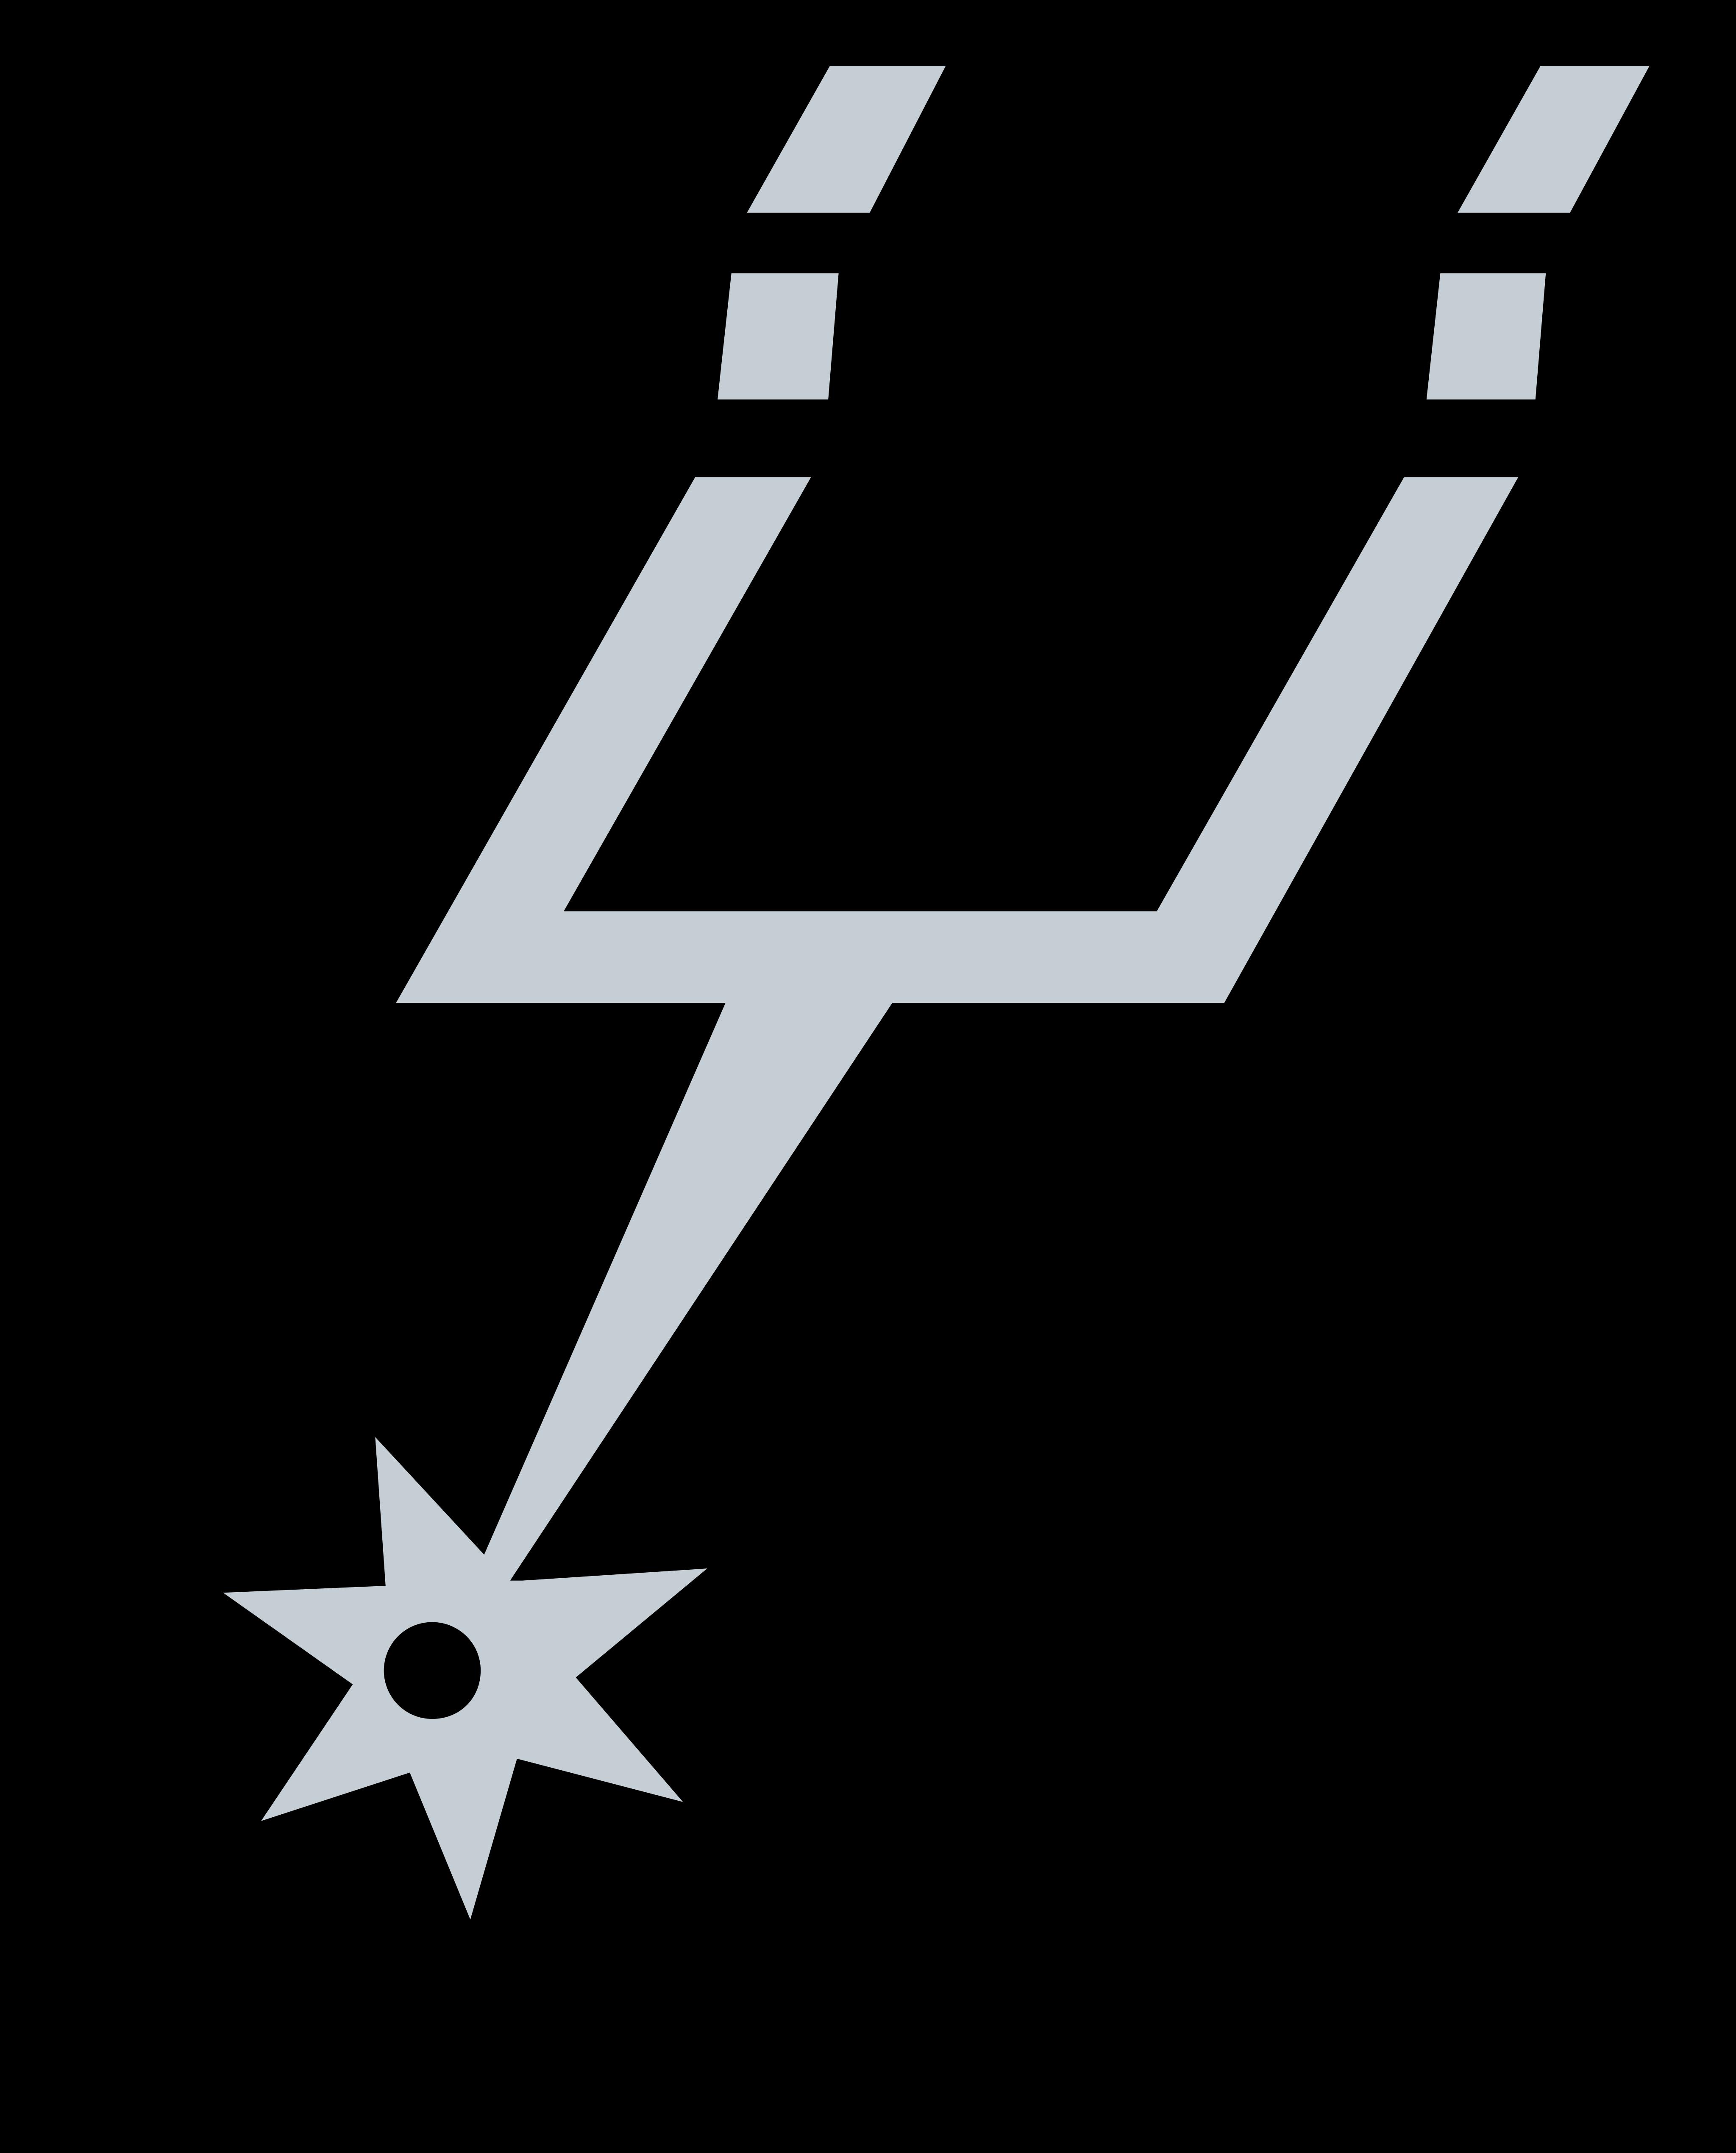 san antonio spurs logo - San Antonio Spurs Logo